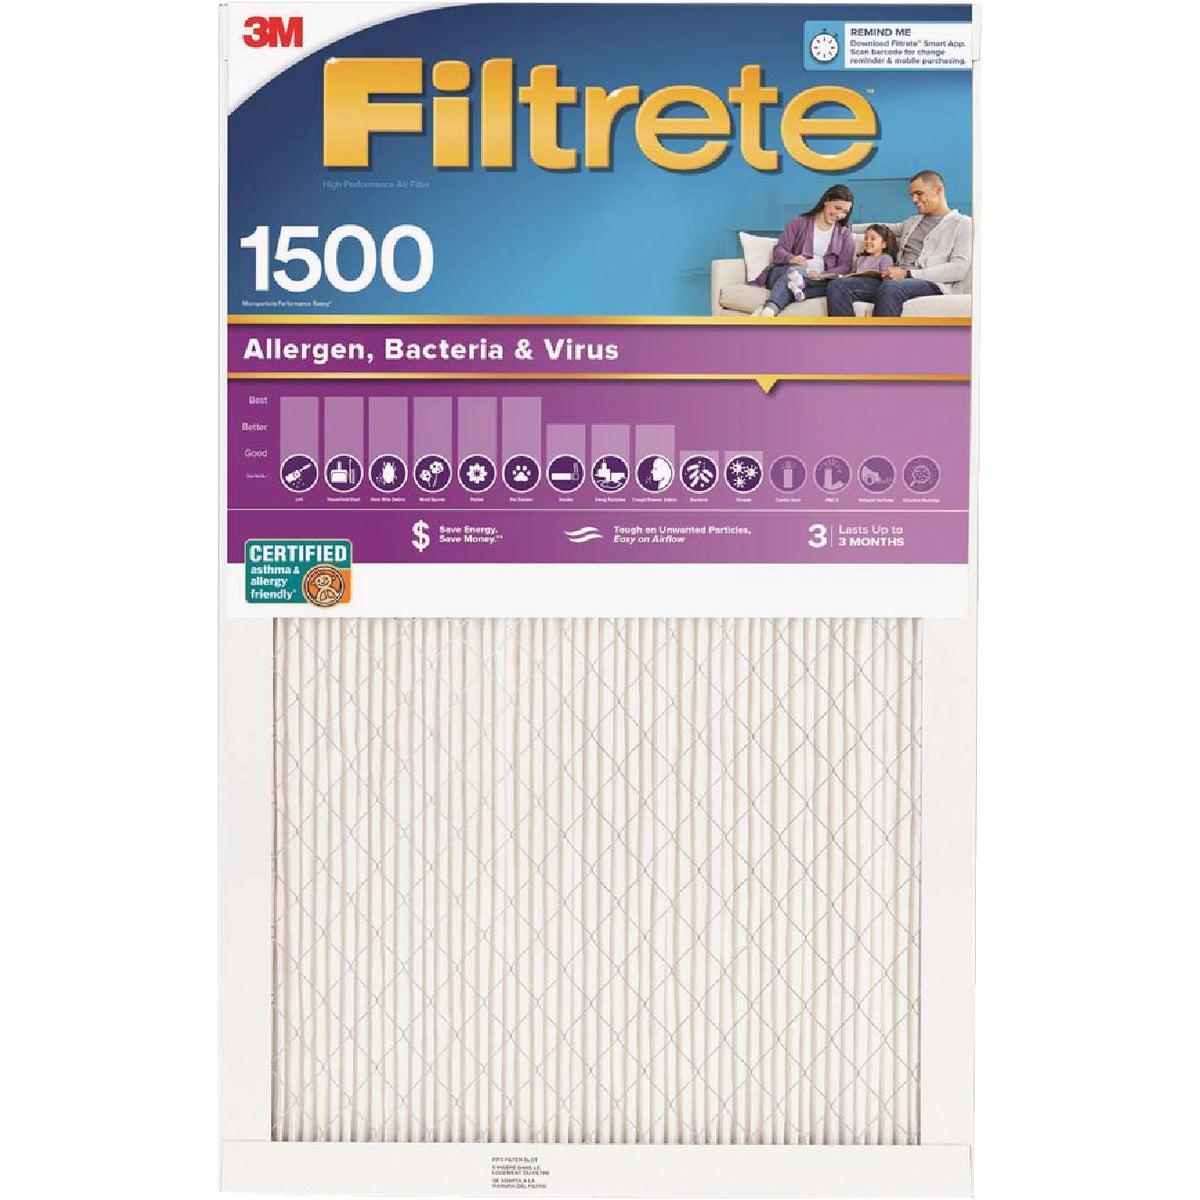 3M Filtrete 16 In. x 25 In. x 1 In. Ultra Allergen Healthy Living 1550 MPR Furnace Filter